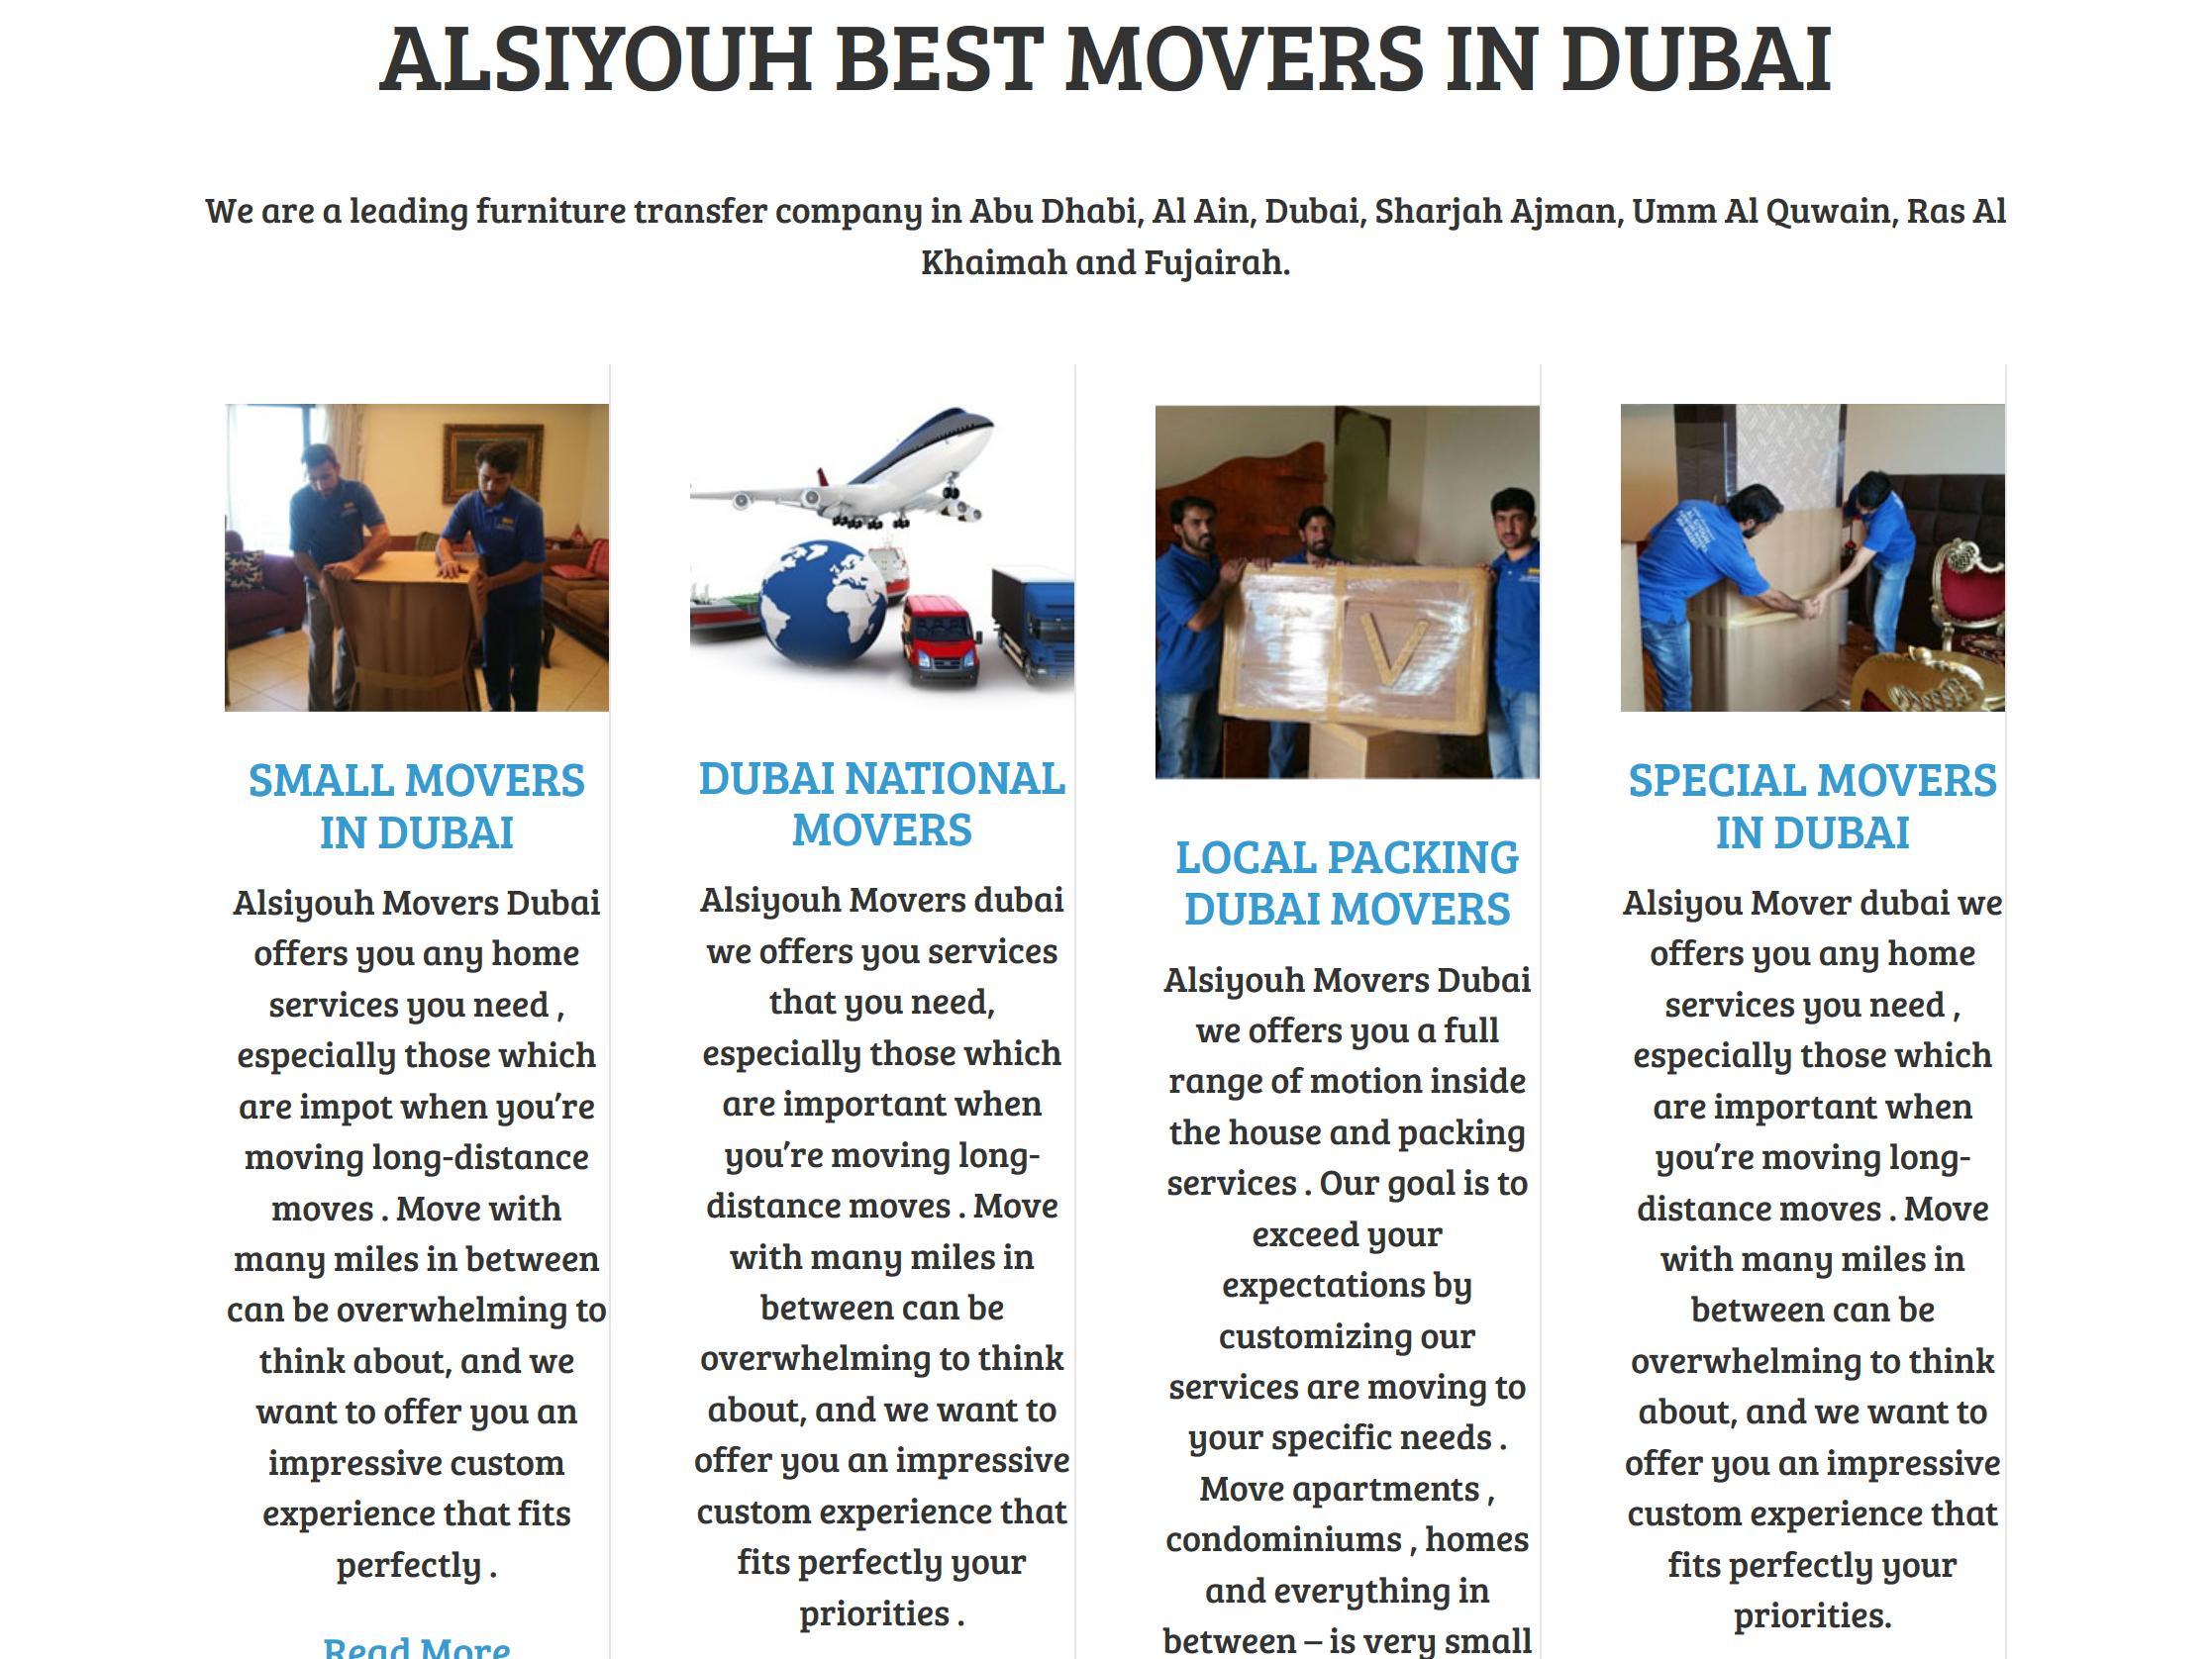 Movers in Dubai|Sharjah|Ajman|Ras Al khema for Android - APK